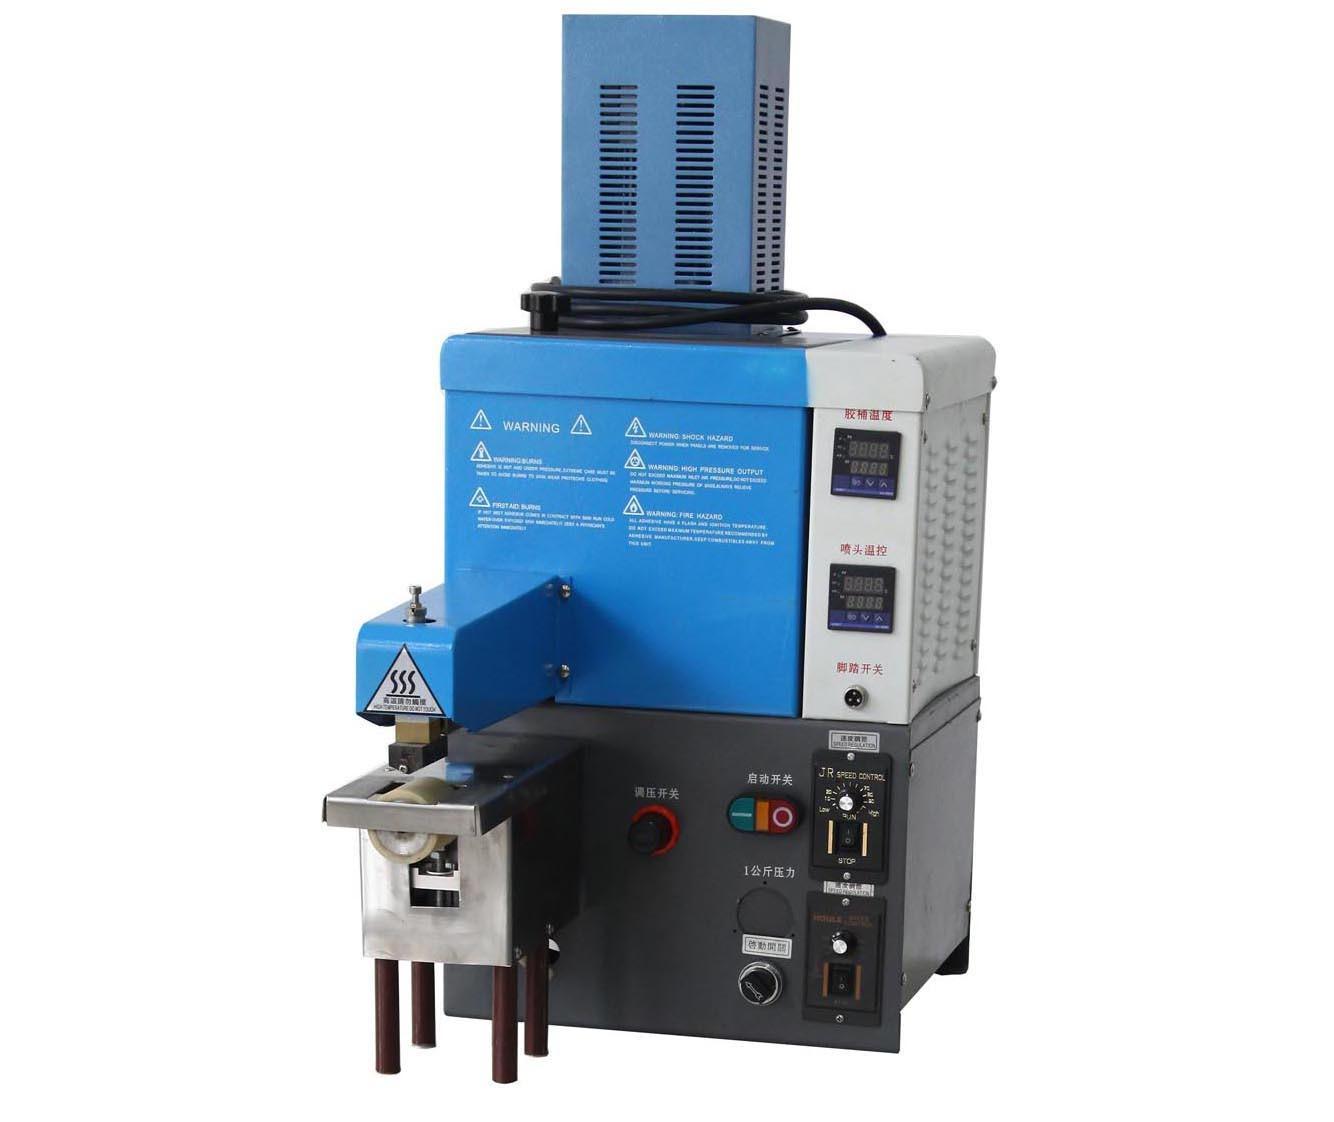 Hot Melt Glue Border Gluing Machine Laminating Machine (LBD-RT1016)